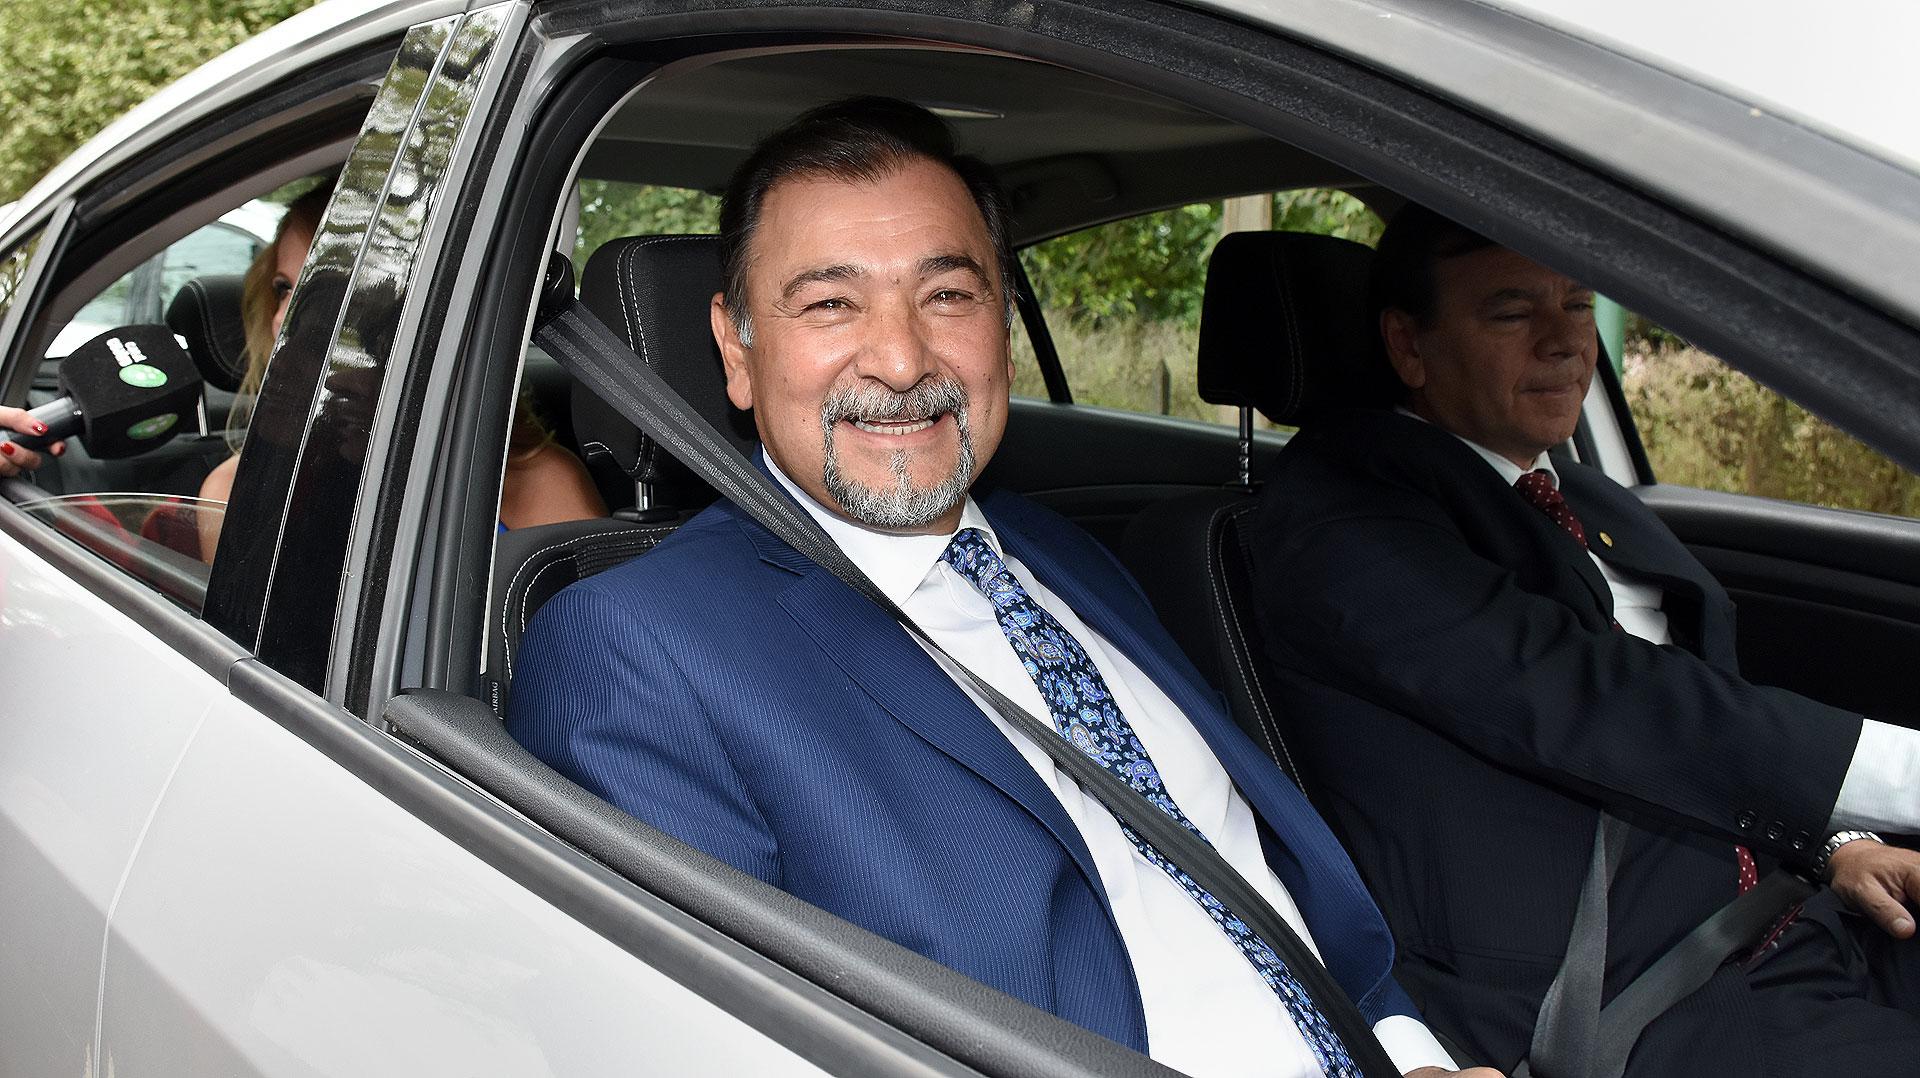 El vicegobernador de Salta, Miguel Isa